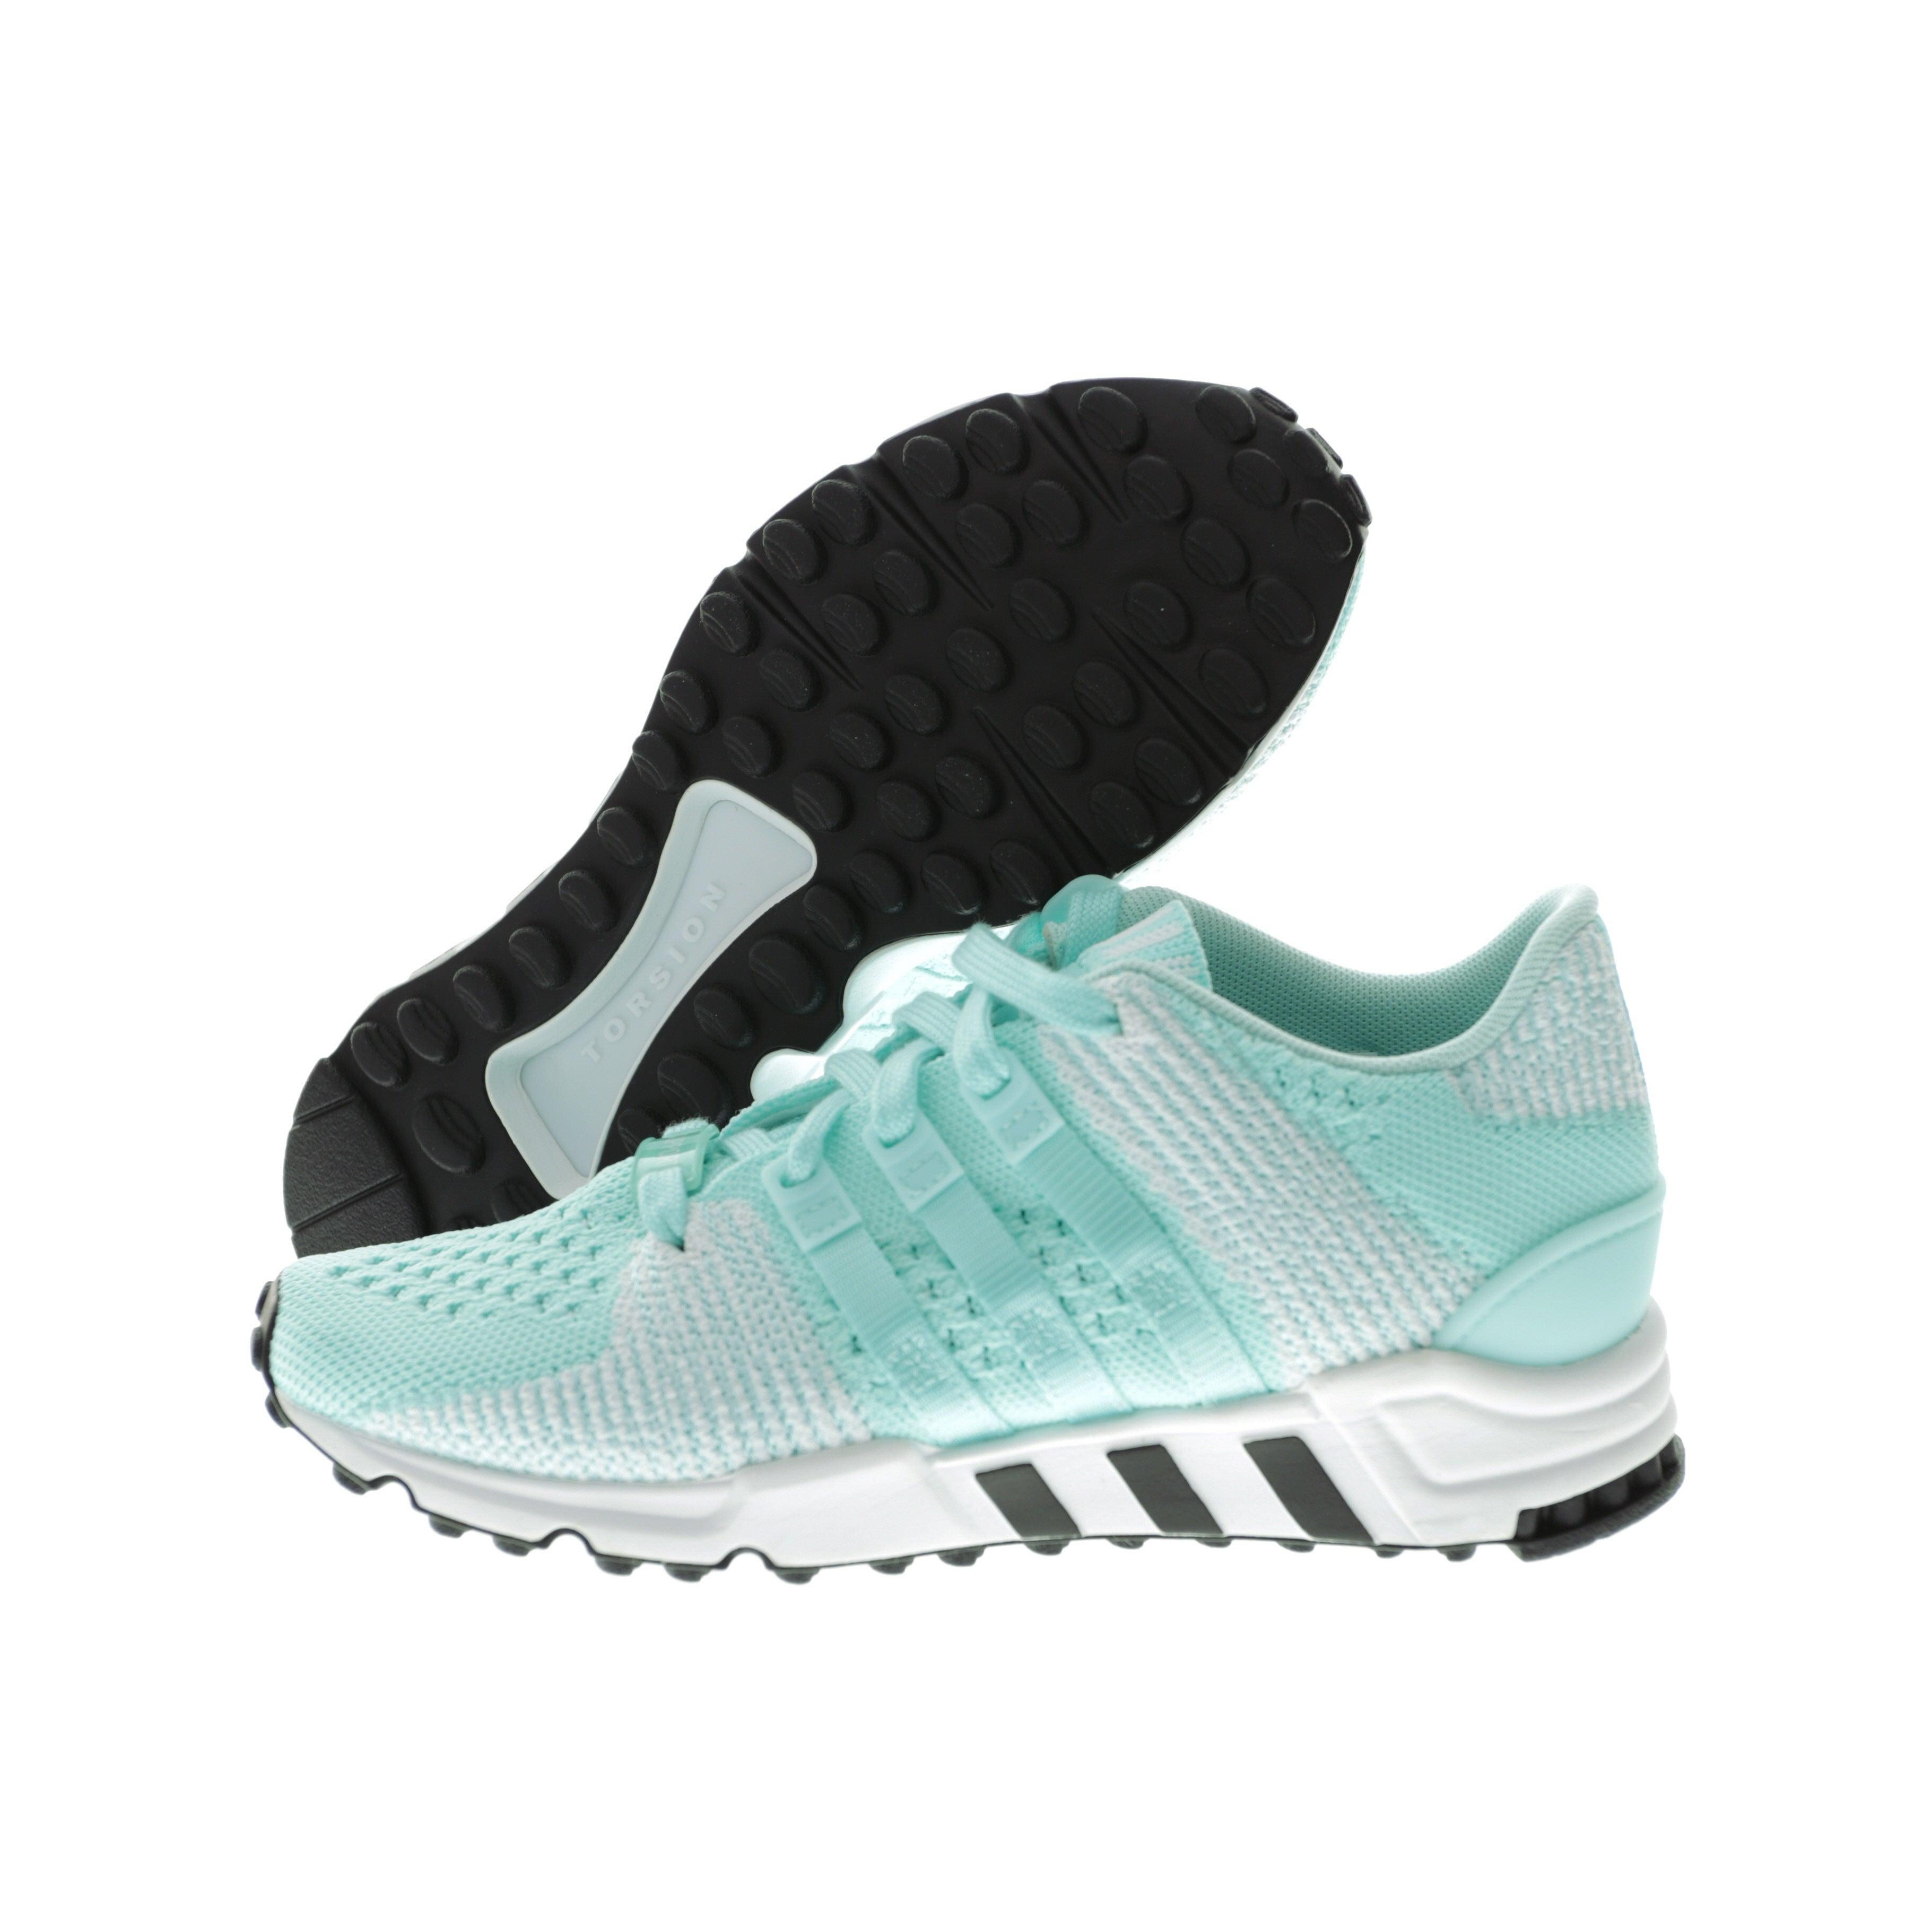 adidas hoodie blue, Adidas originals eqt support rf sneakers